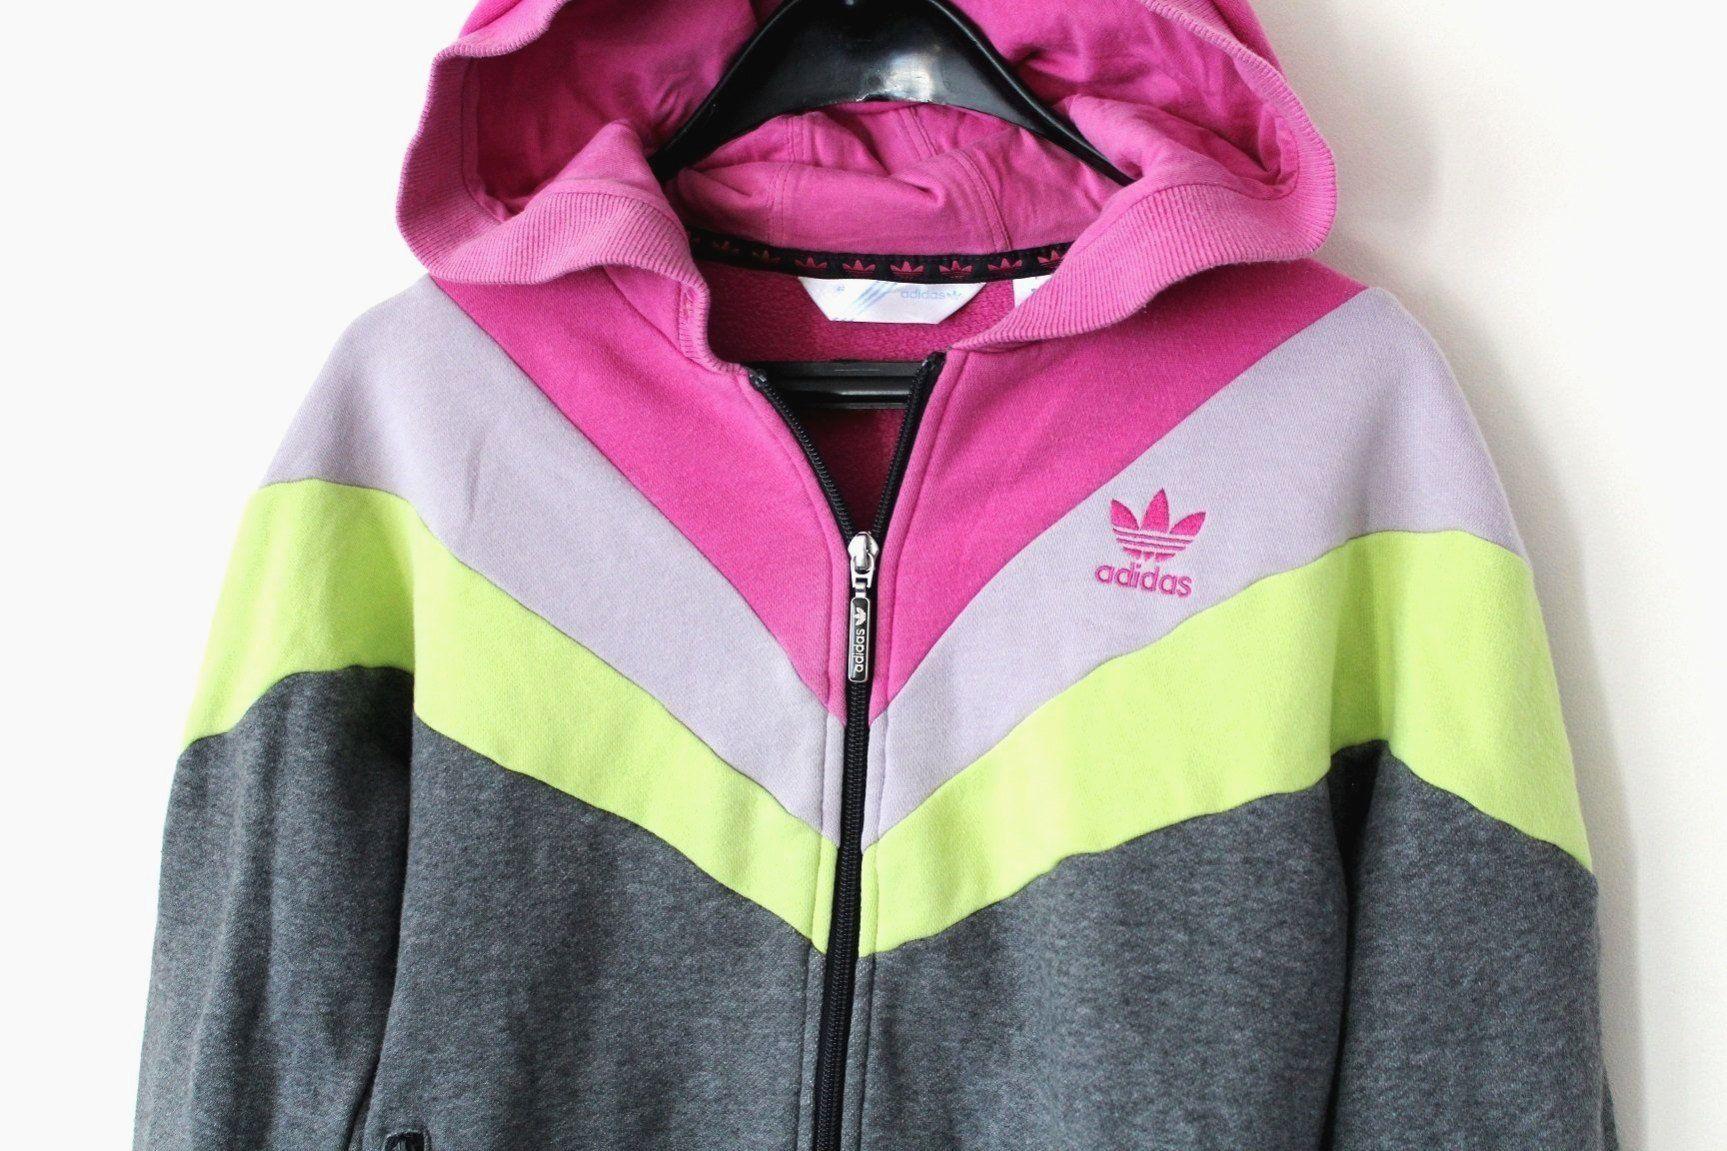 Vintage adidas jacke farbblock adidas sweatshirt grau rosa